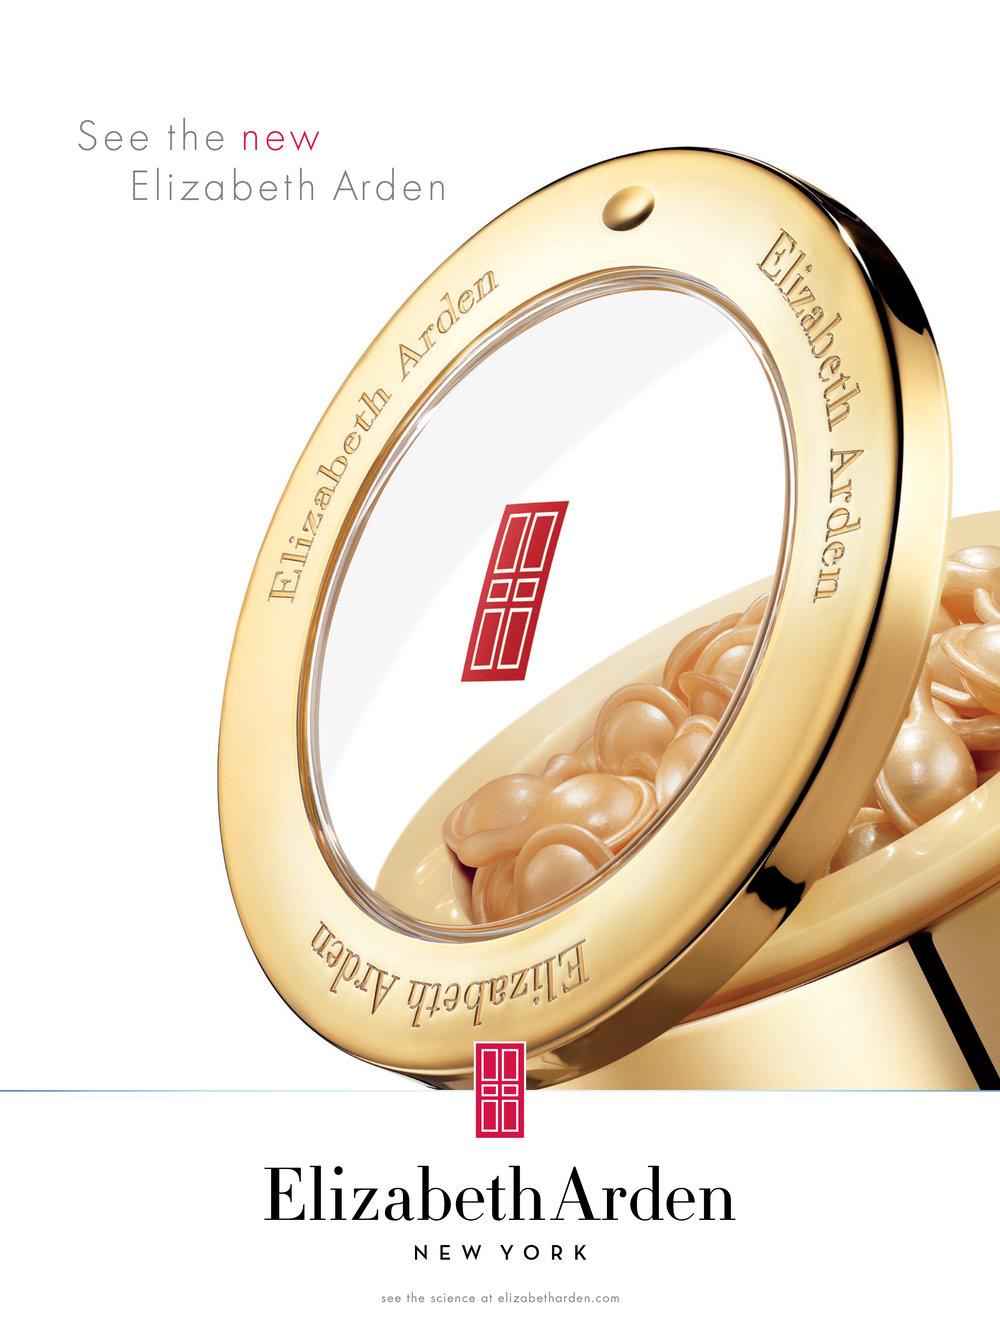 ElizabethArden3.jpg